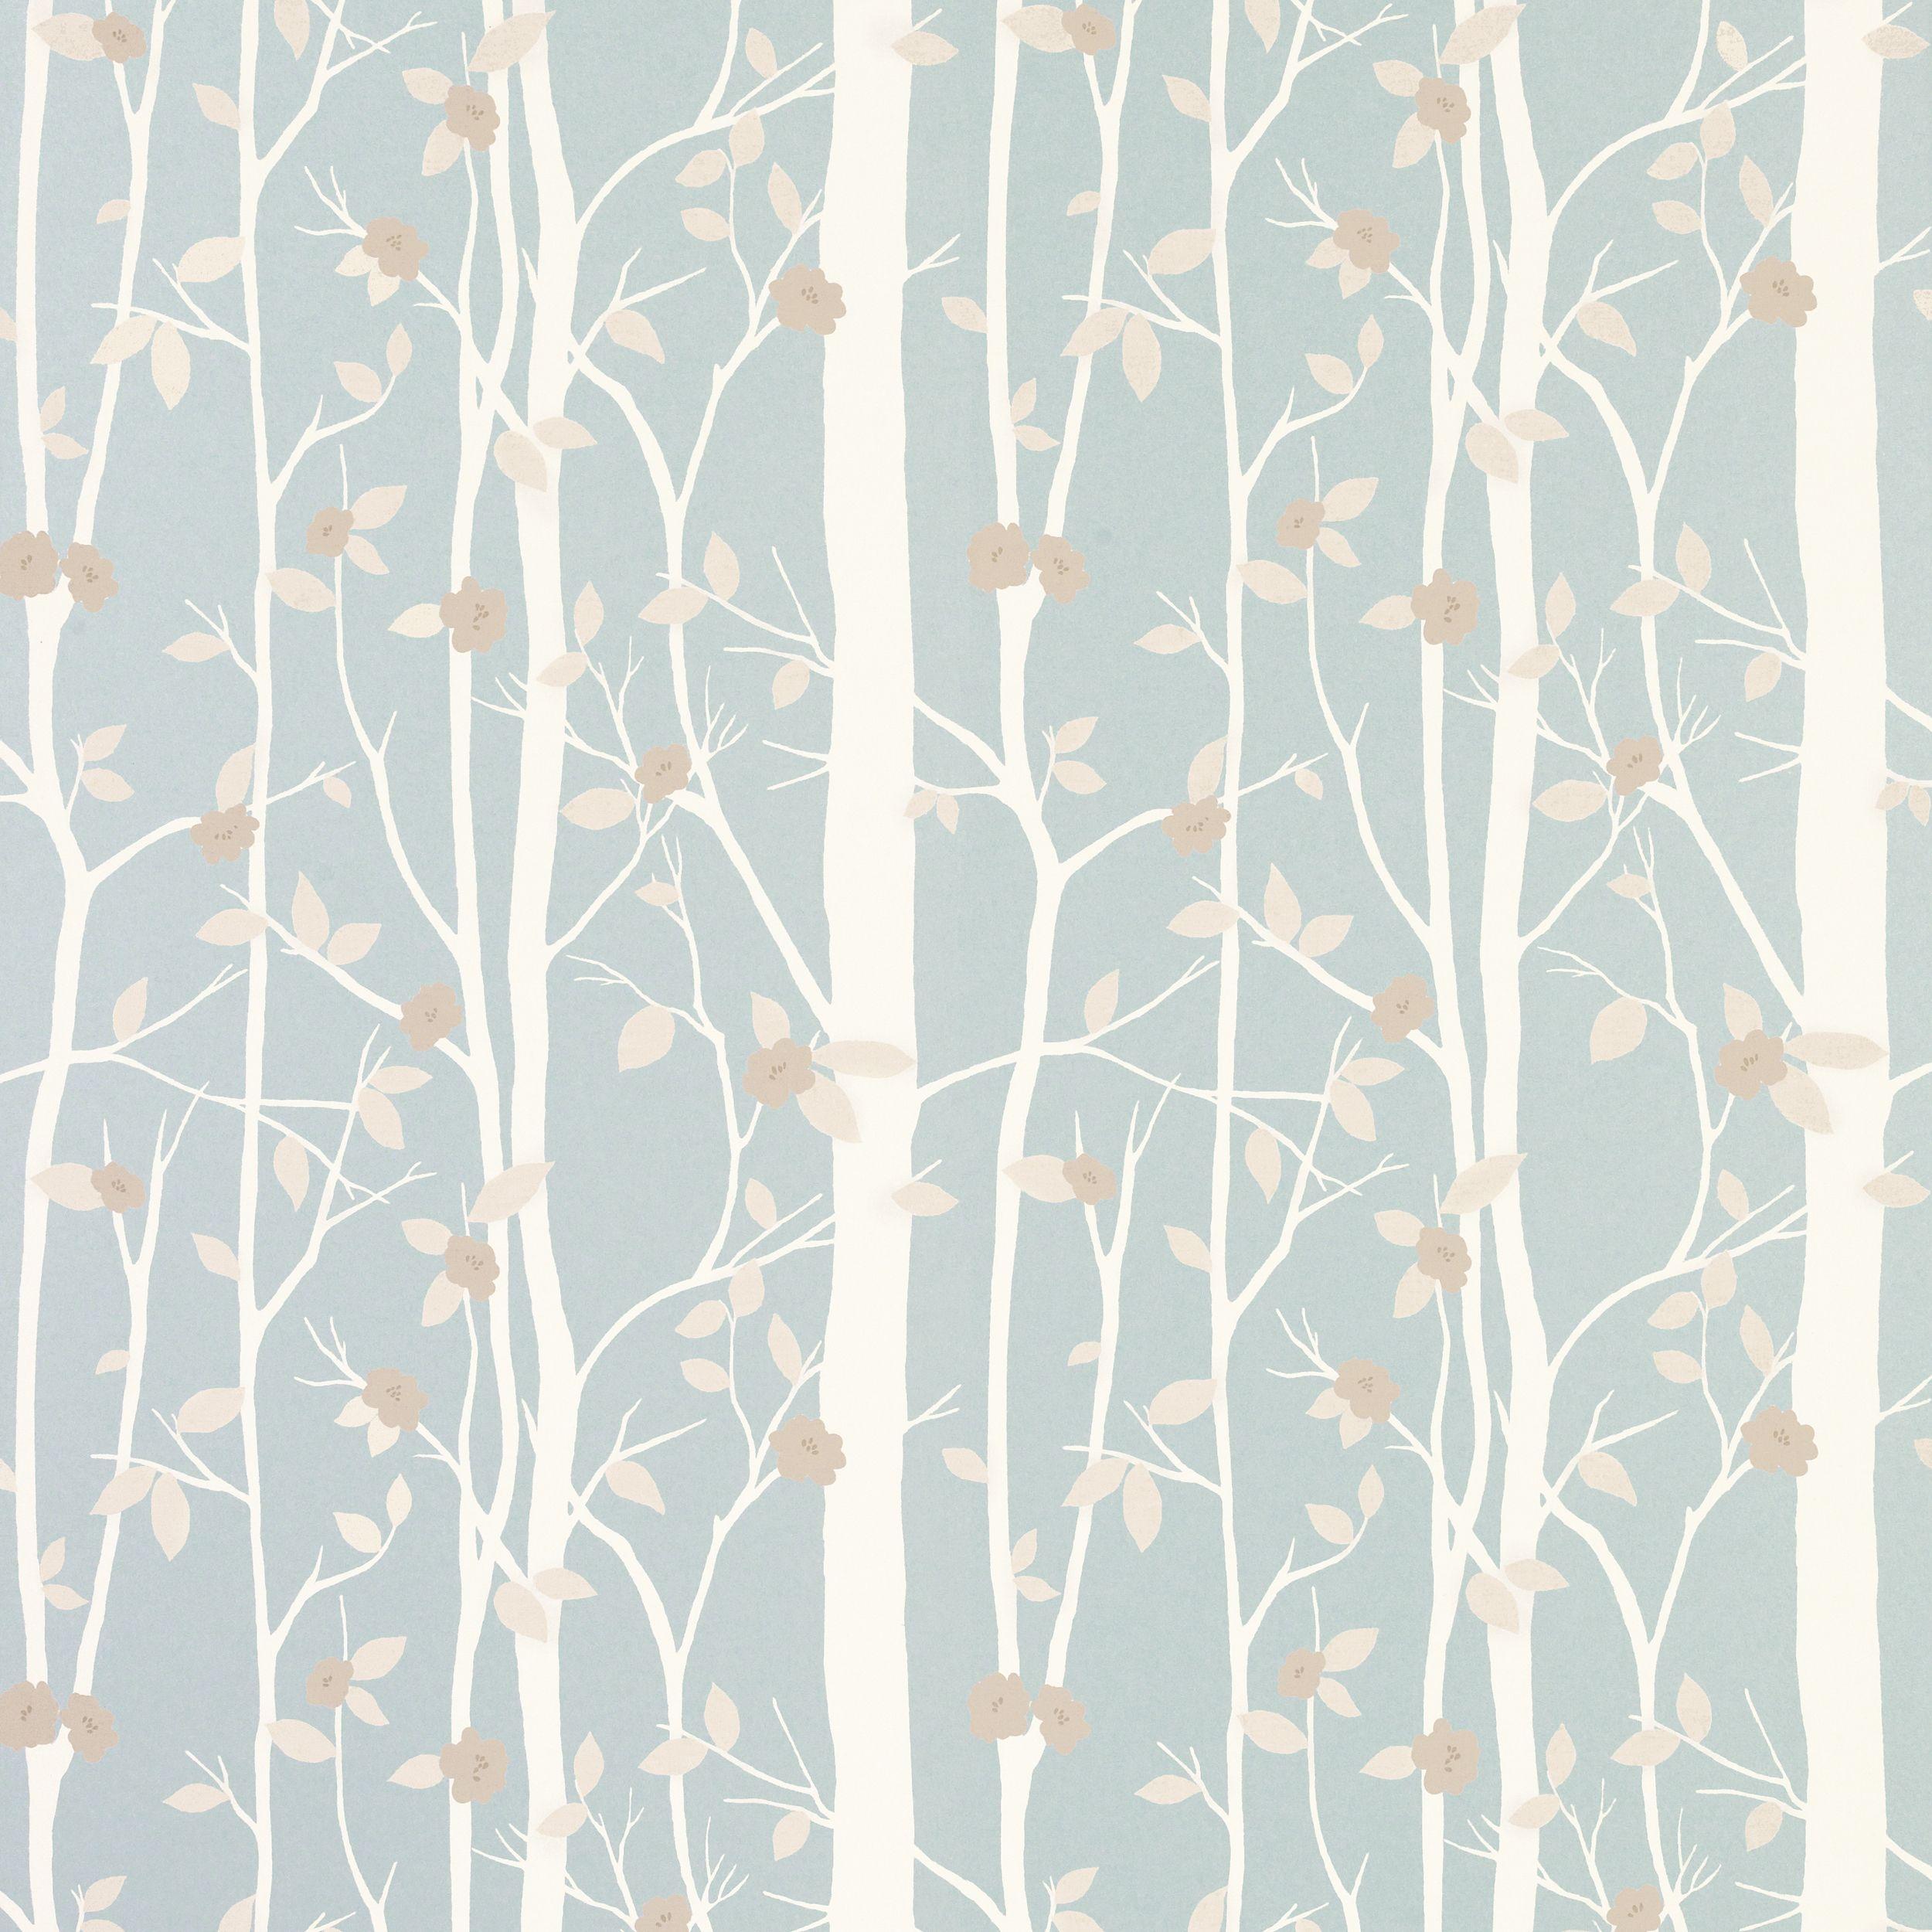 Cottonwood Duck Egg Leaf Wallpaper Productview 3534845 Cottonwood